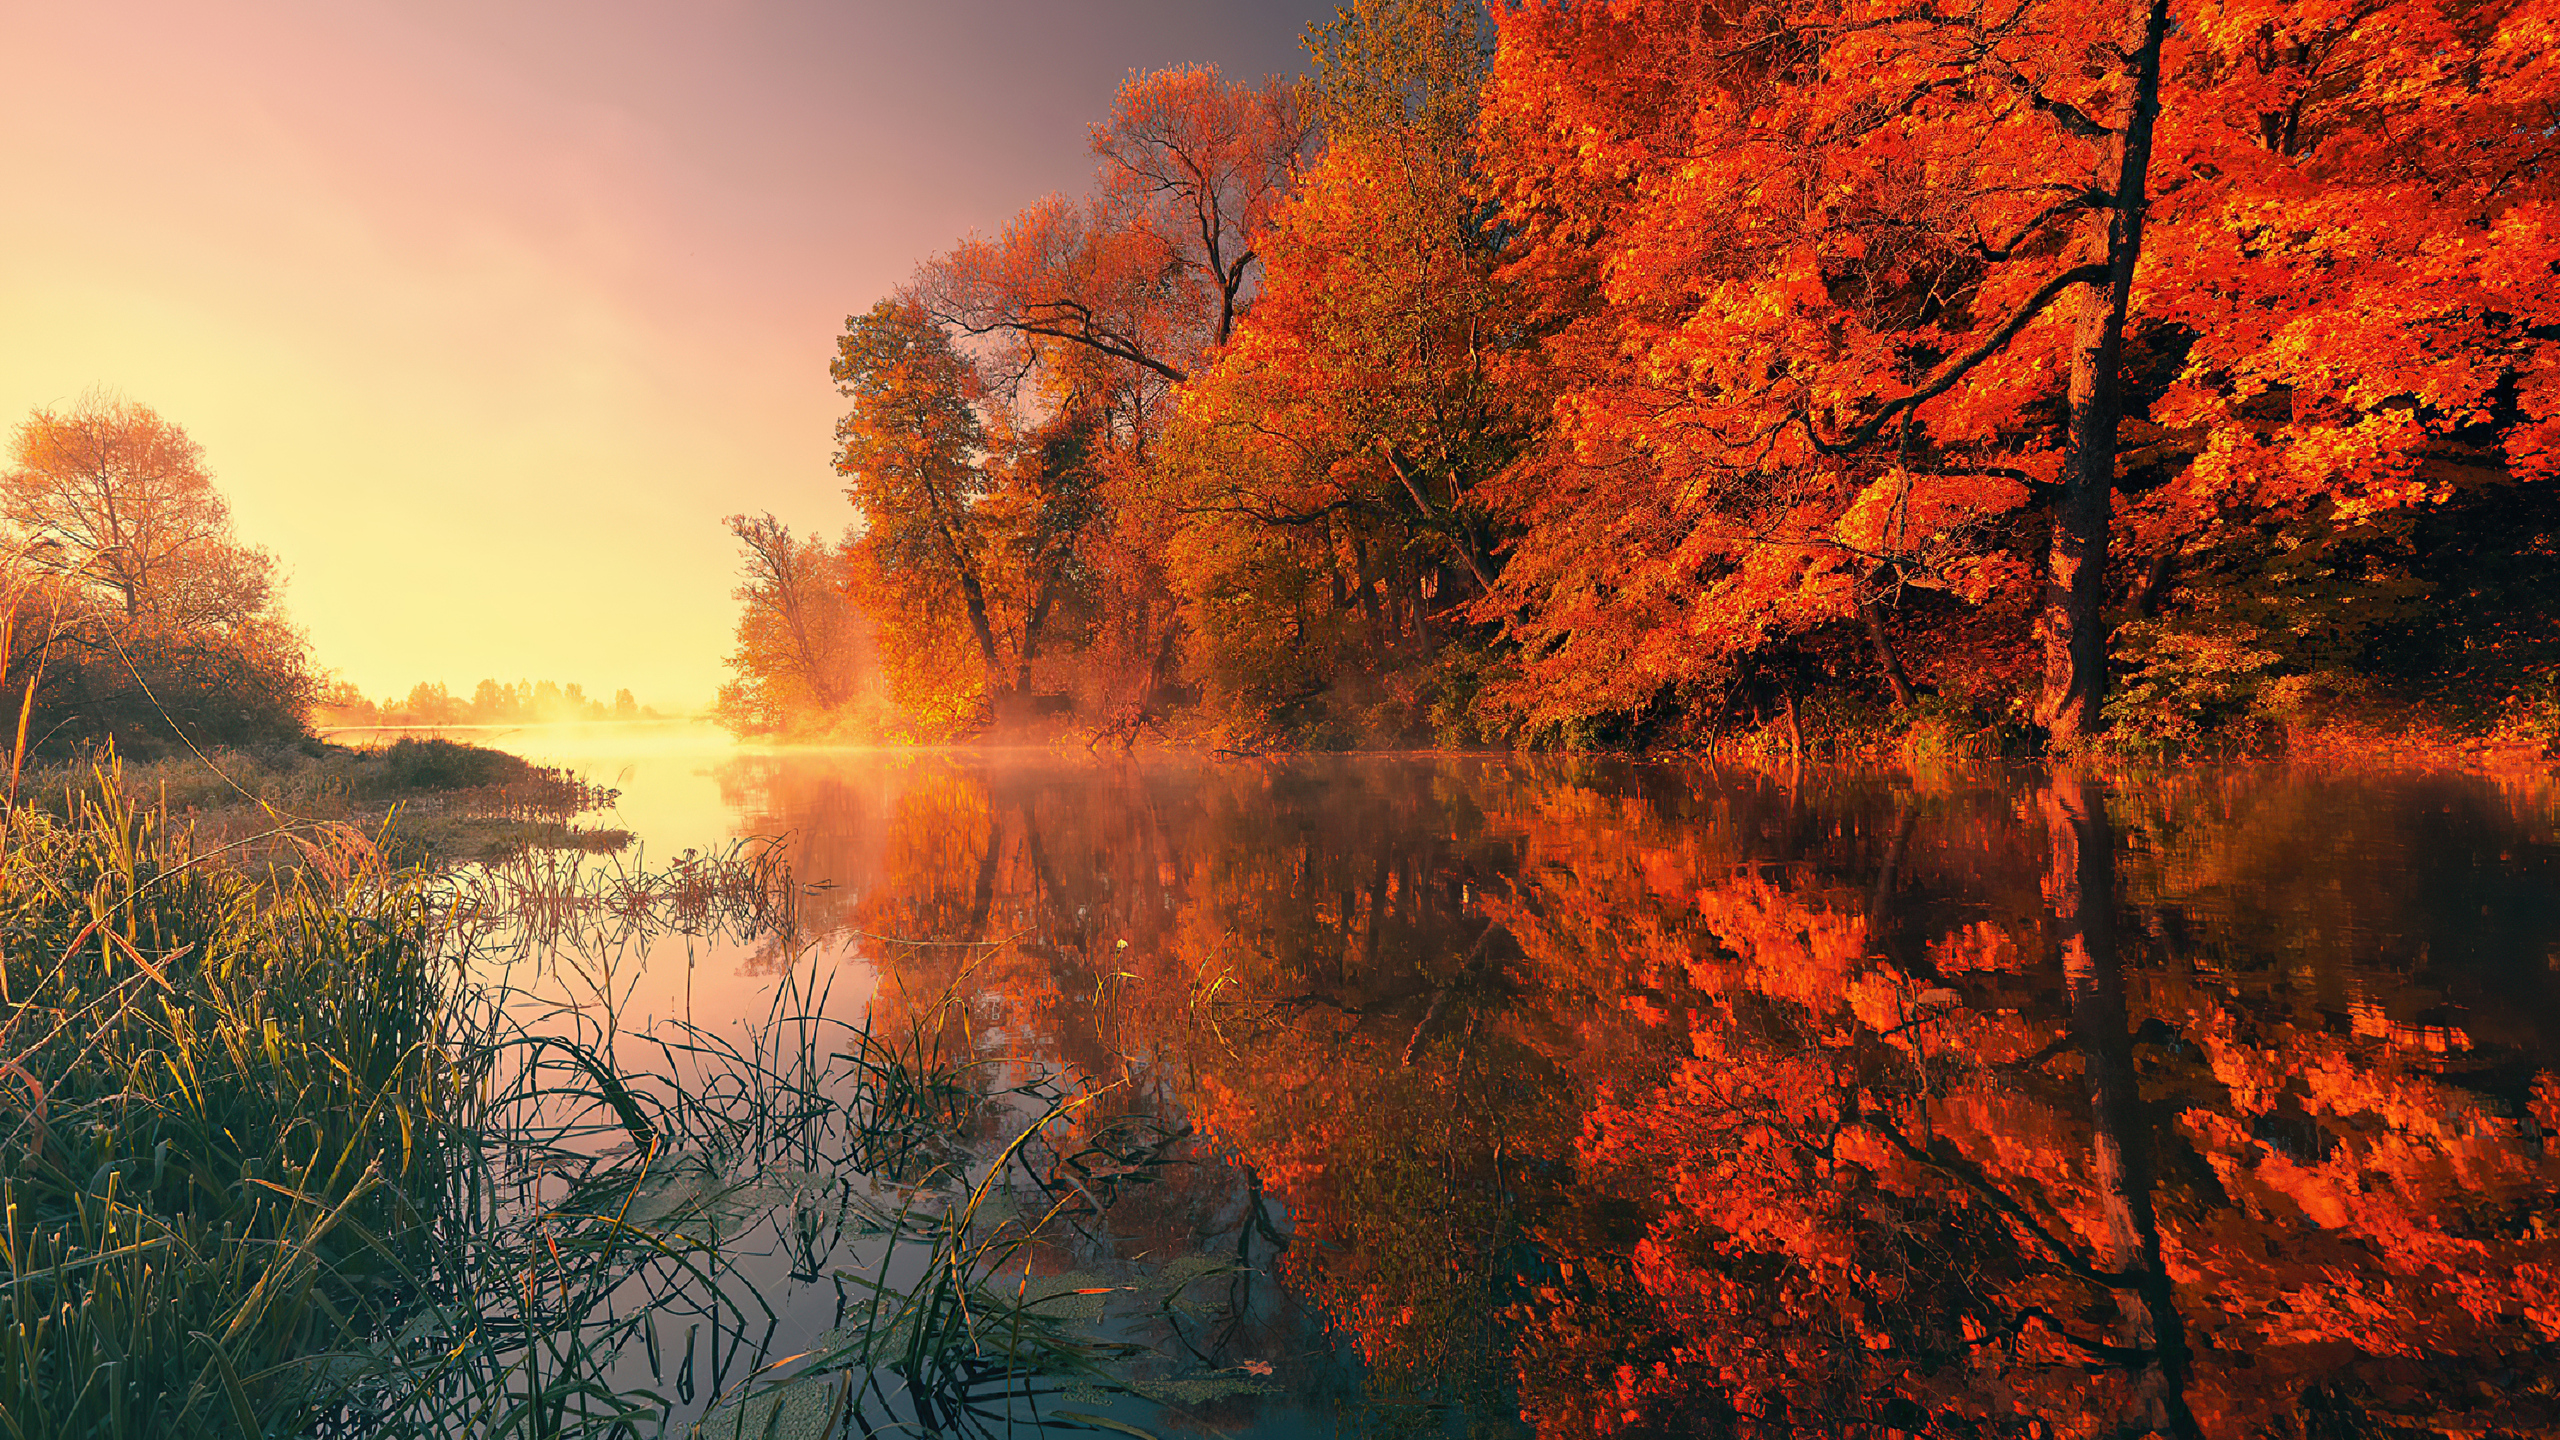 trees-fall-reflection-autumn-4k-hb.jpg